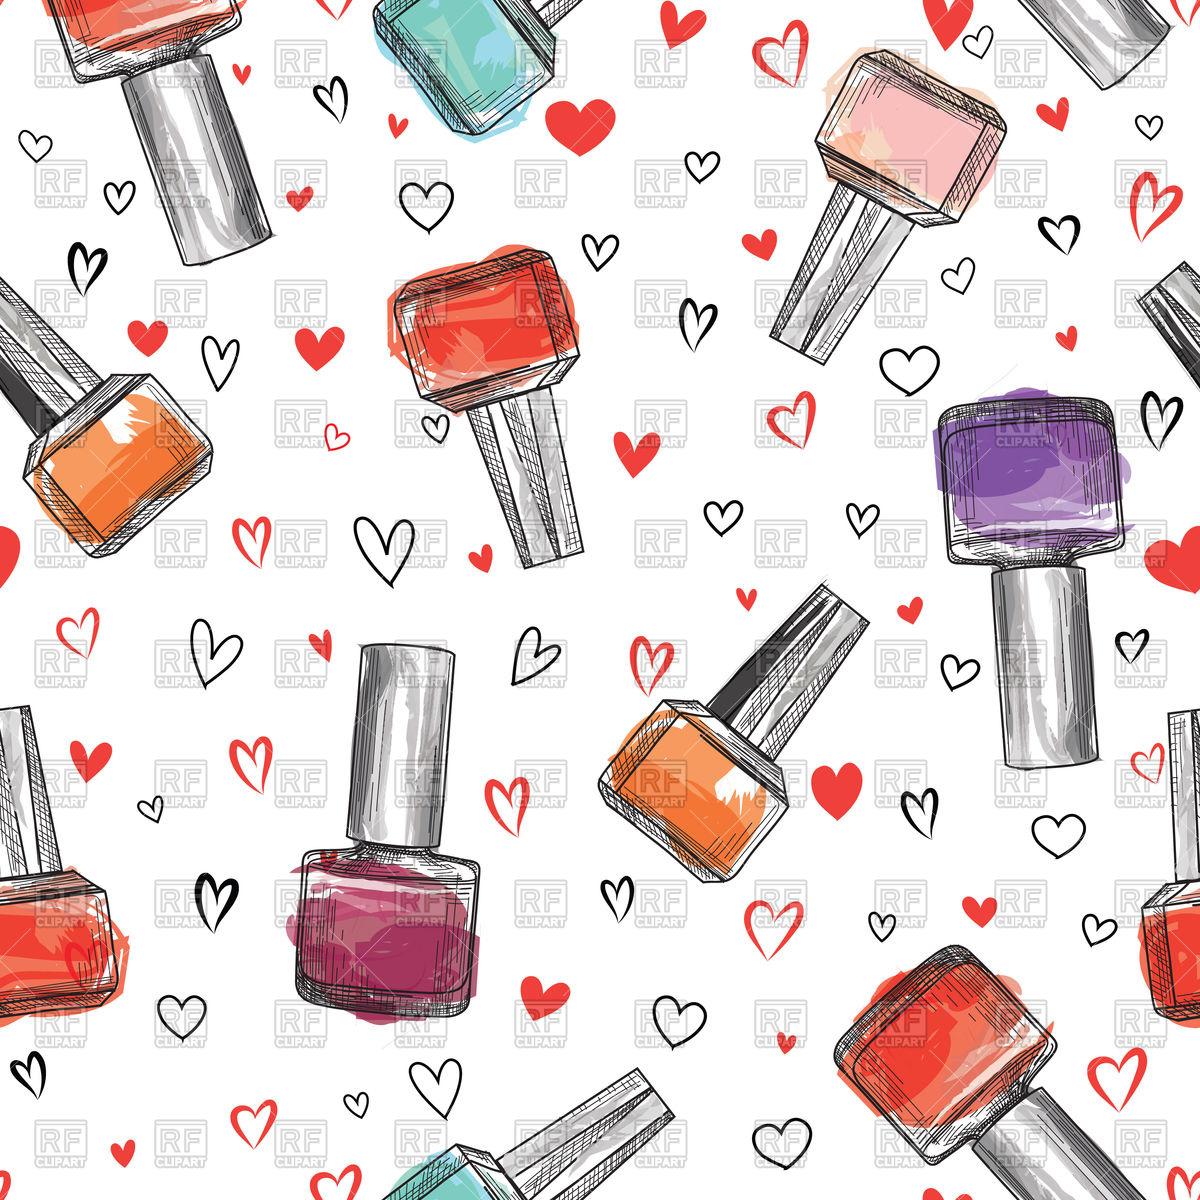 Beauty salon seamless pattern. Nail polish bottle background. Stock Vector  Image.